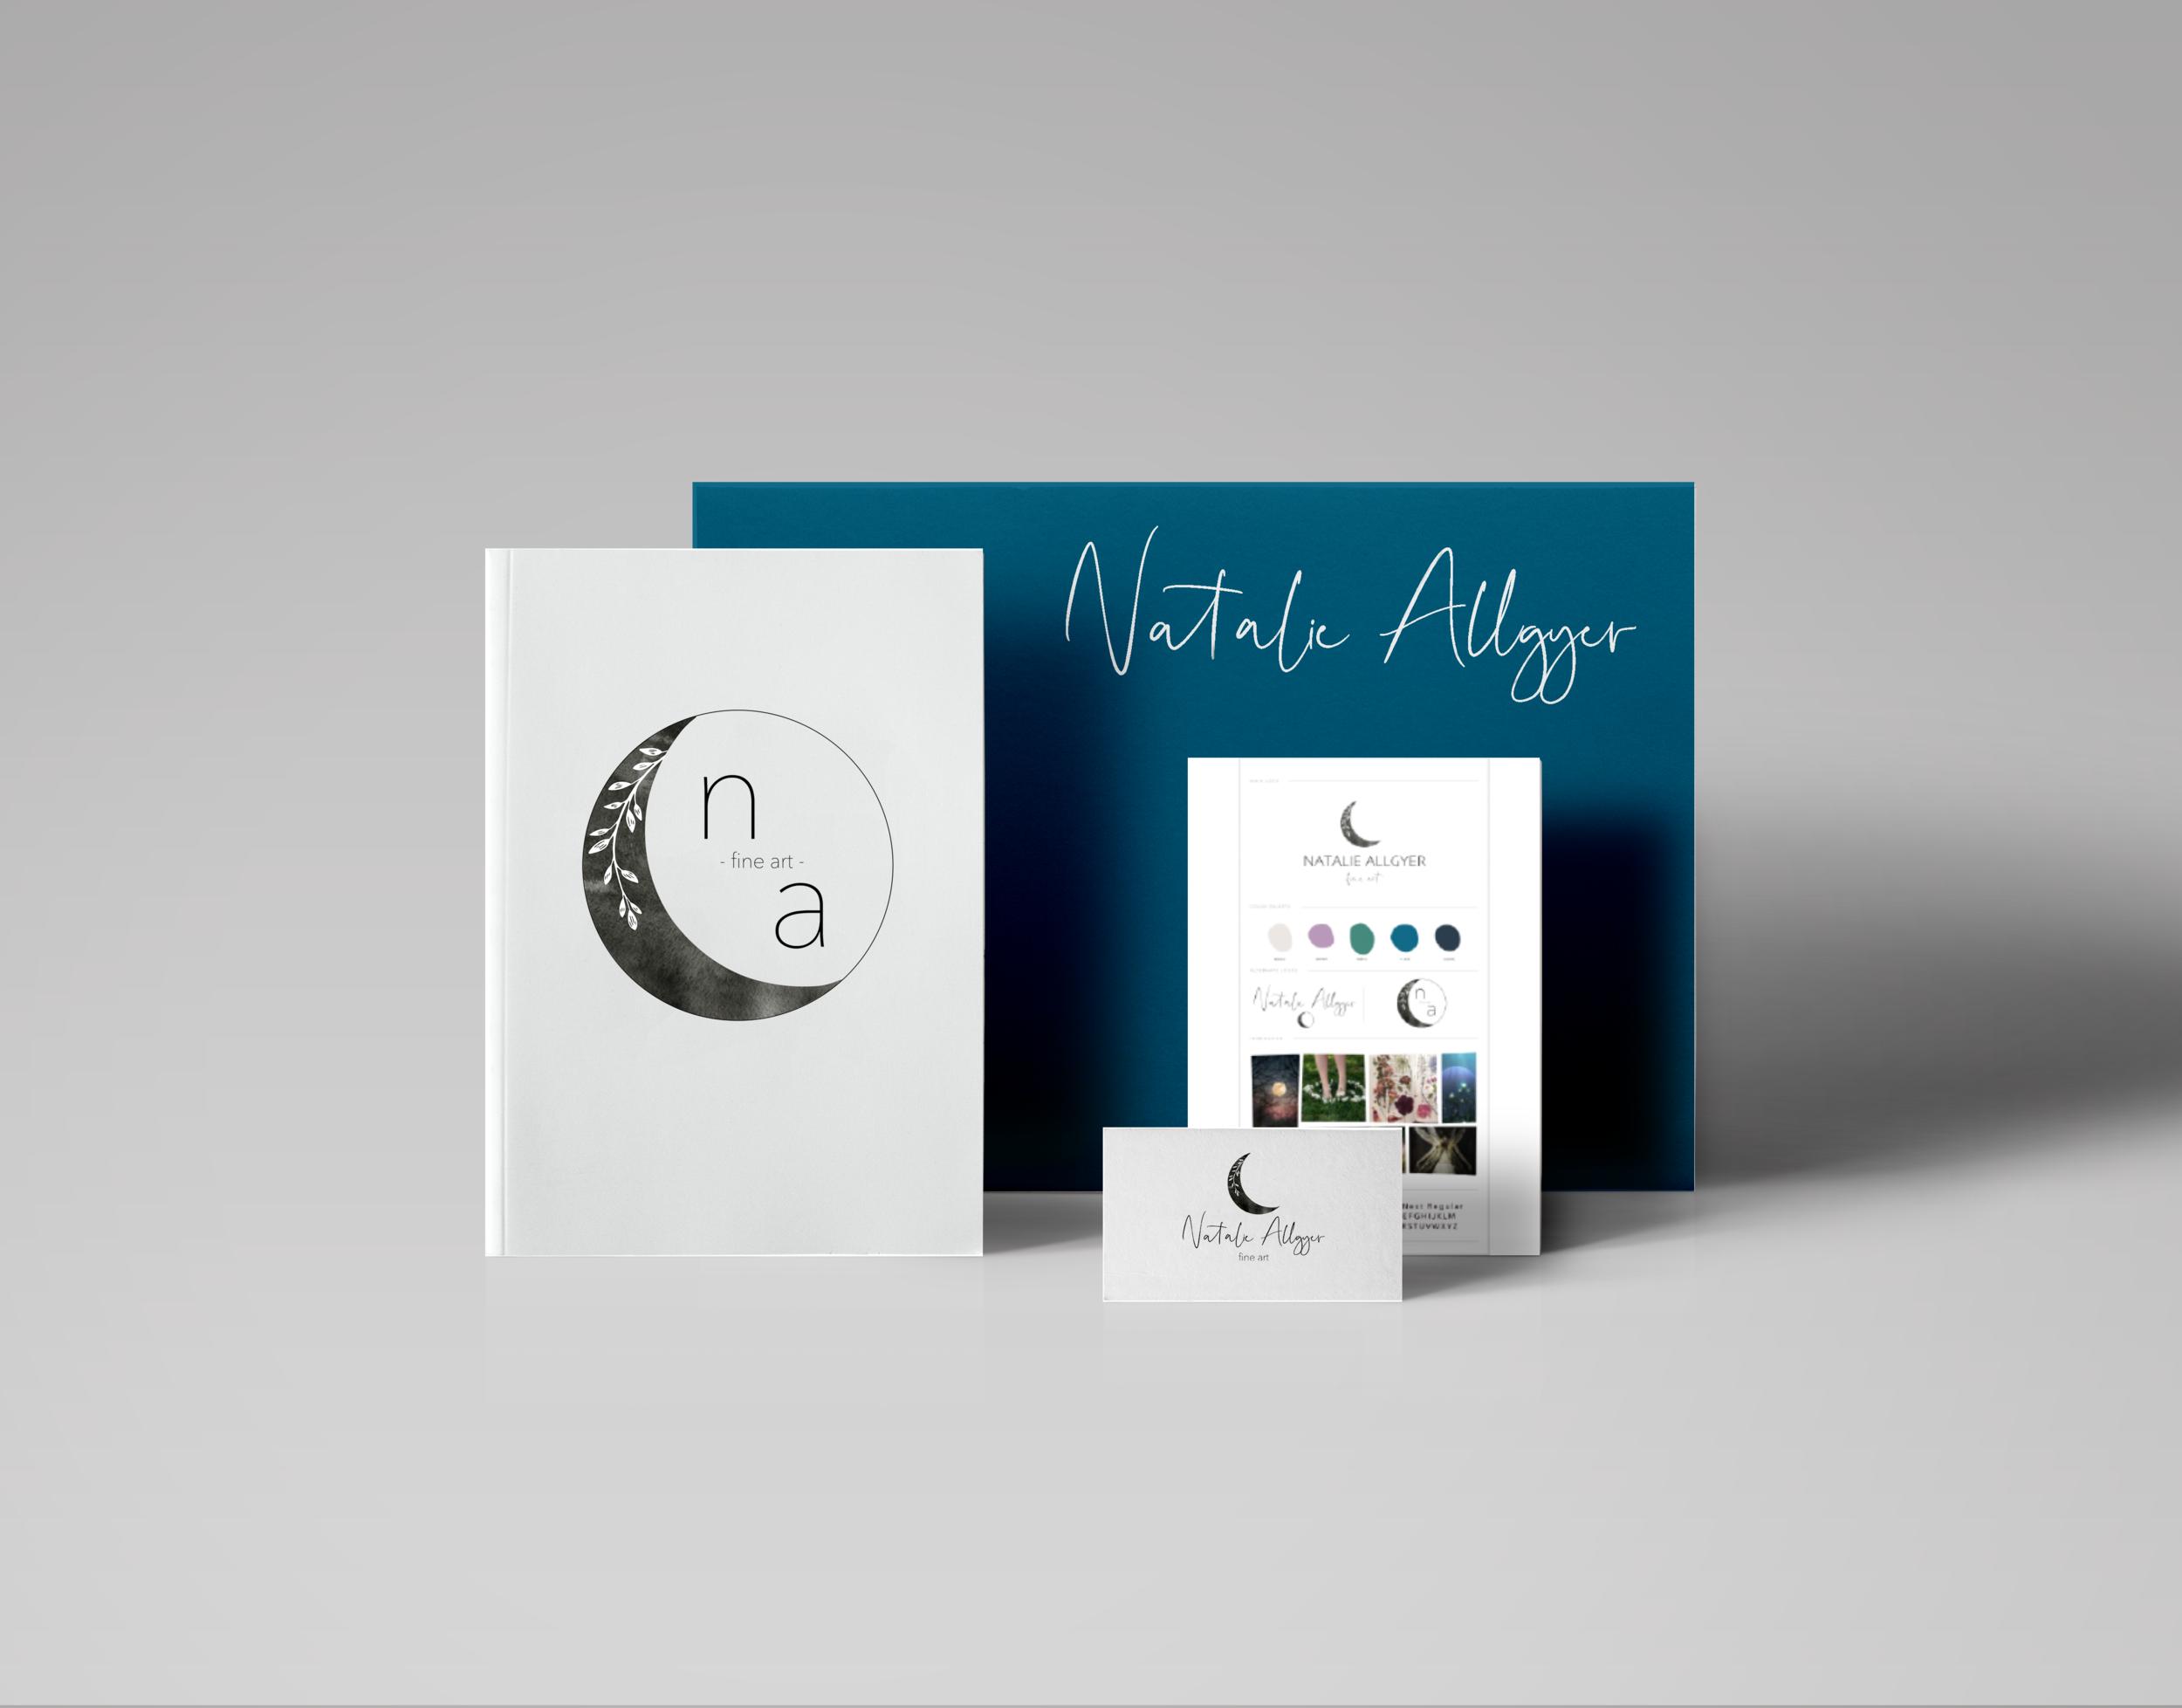 branding-graphic-design-yoga-wellness-health-art-photography-entrepreneur-brand-board-mood-inspiration